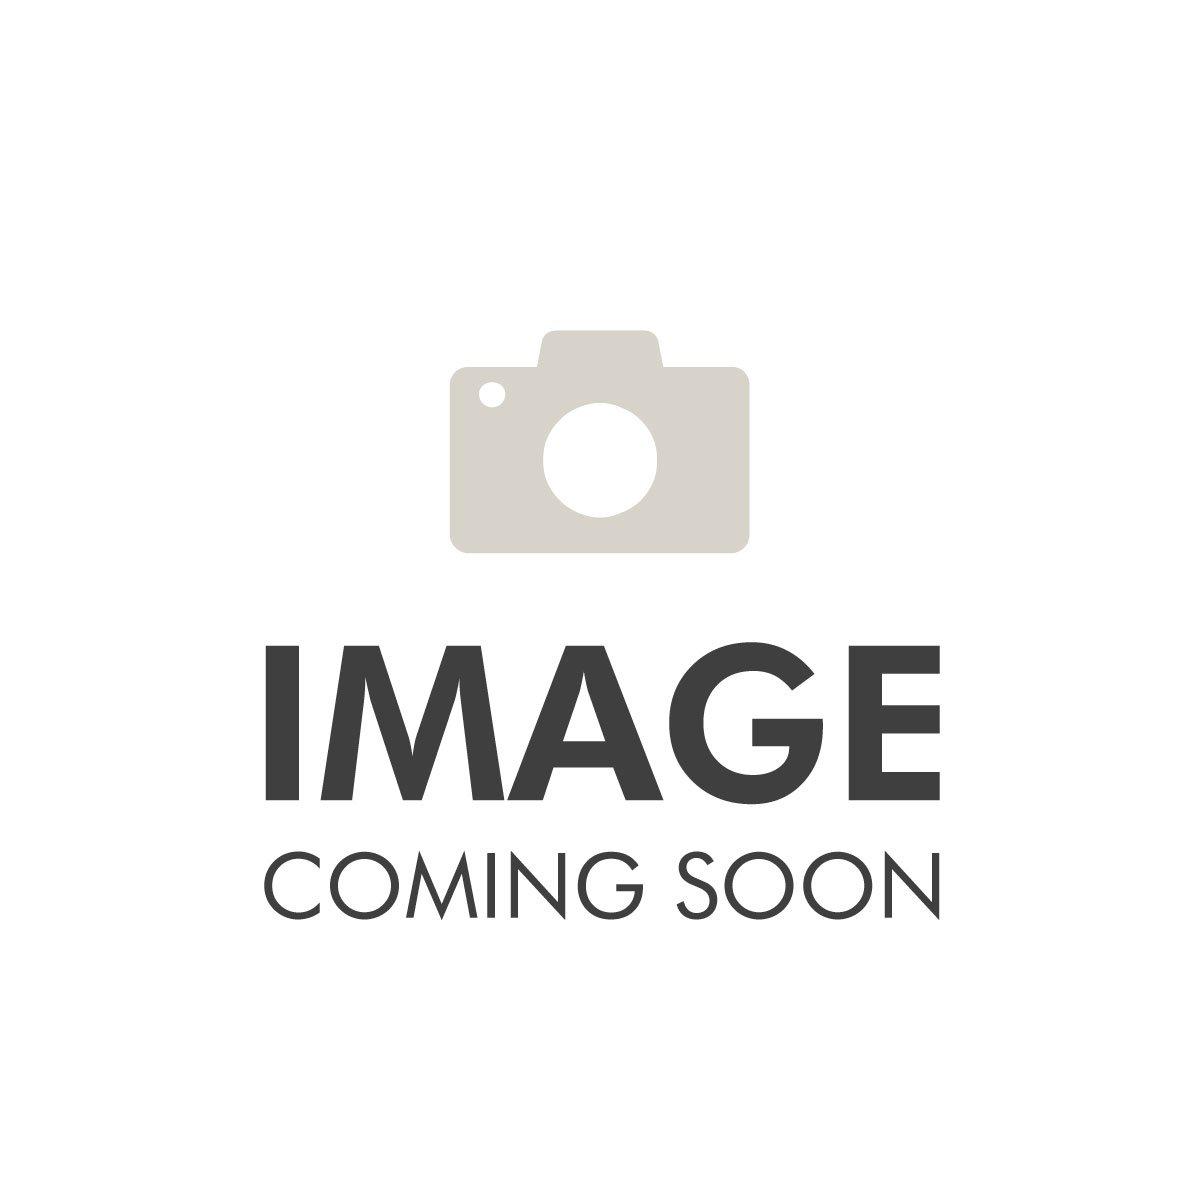 Leon Paul - FIE Foil Blade - Maraging